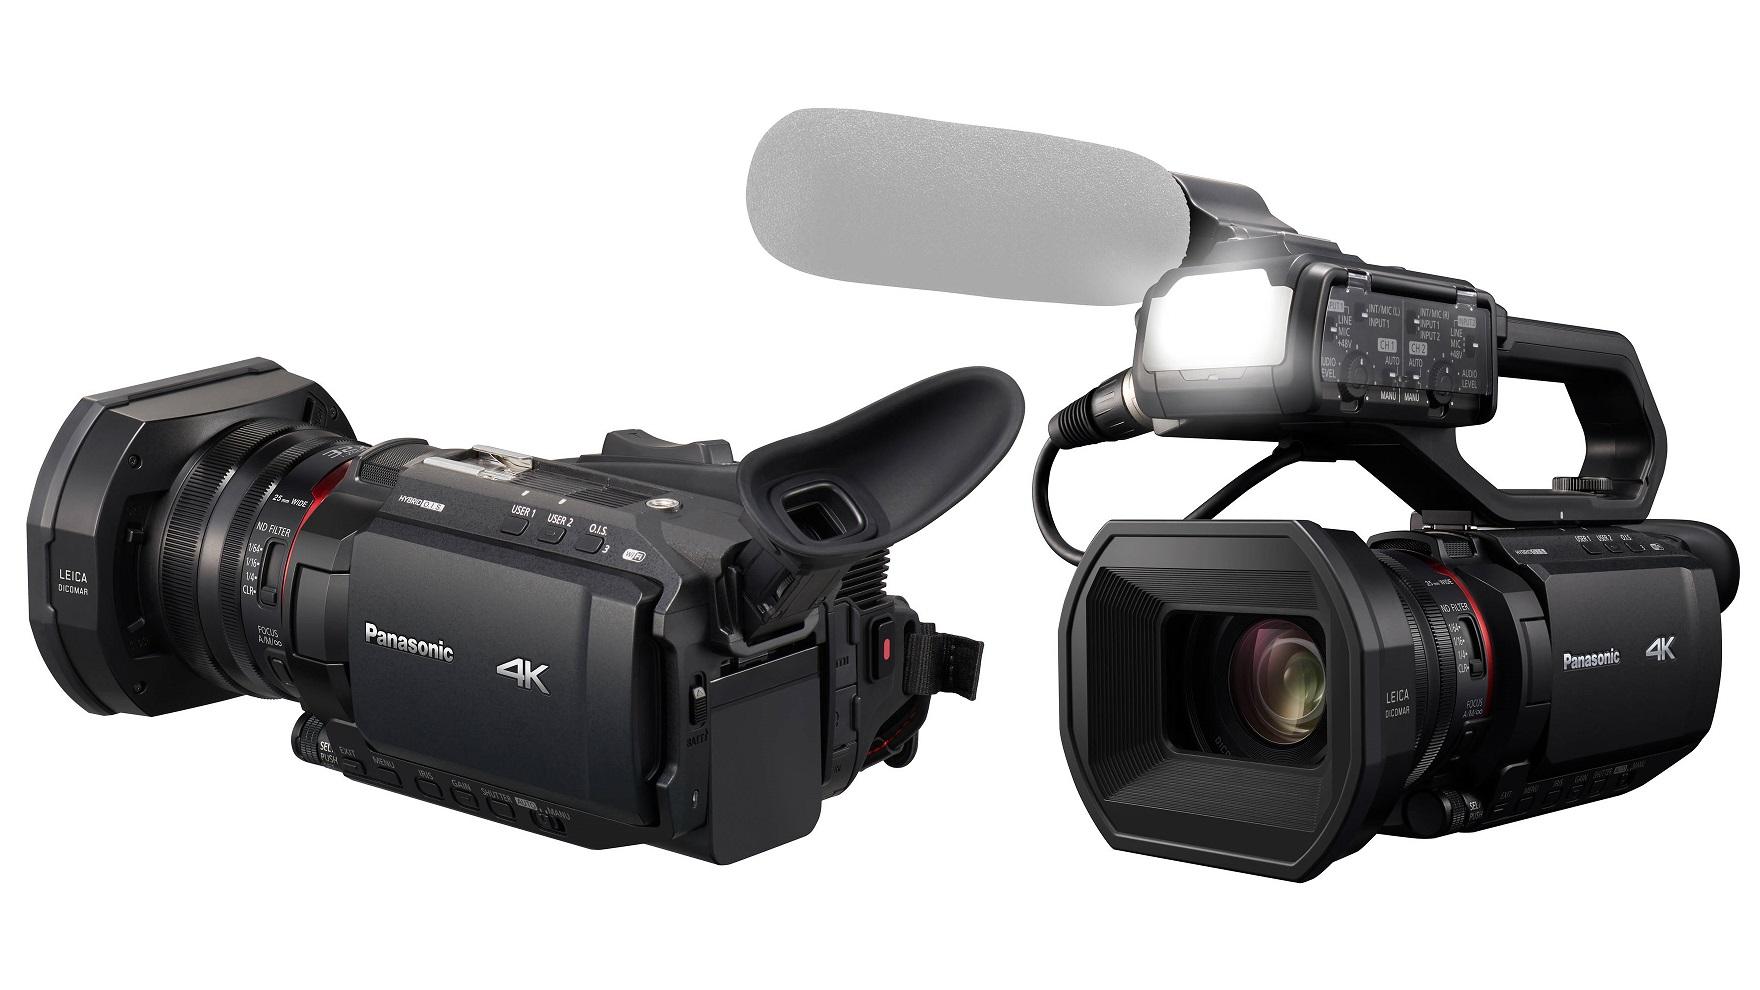 Panasonic anuncia tres nuevas videocámaras 4K 60p – HC-X1500, HC-X2000 y AG-CX10